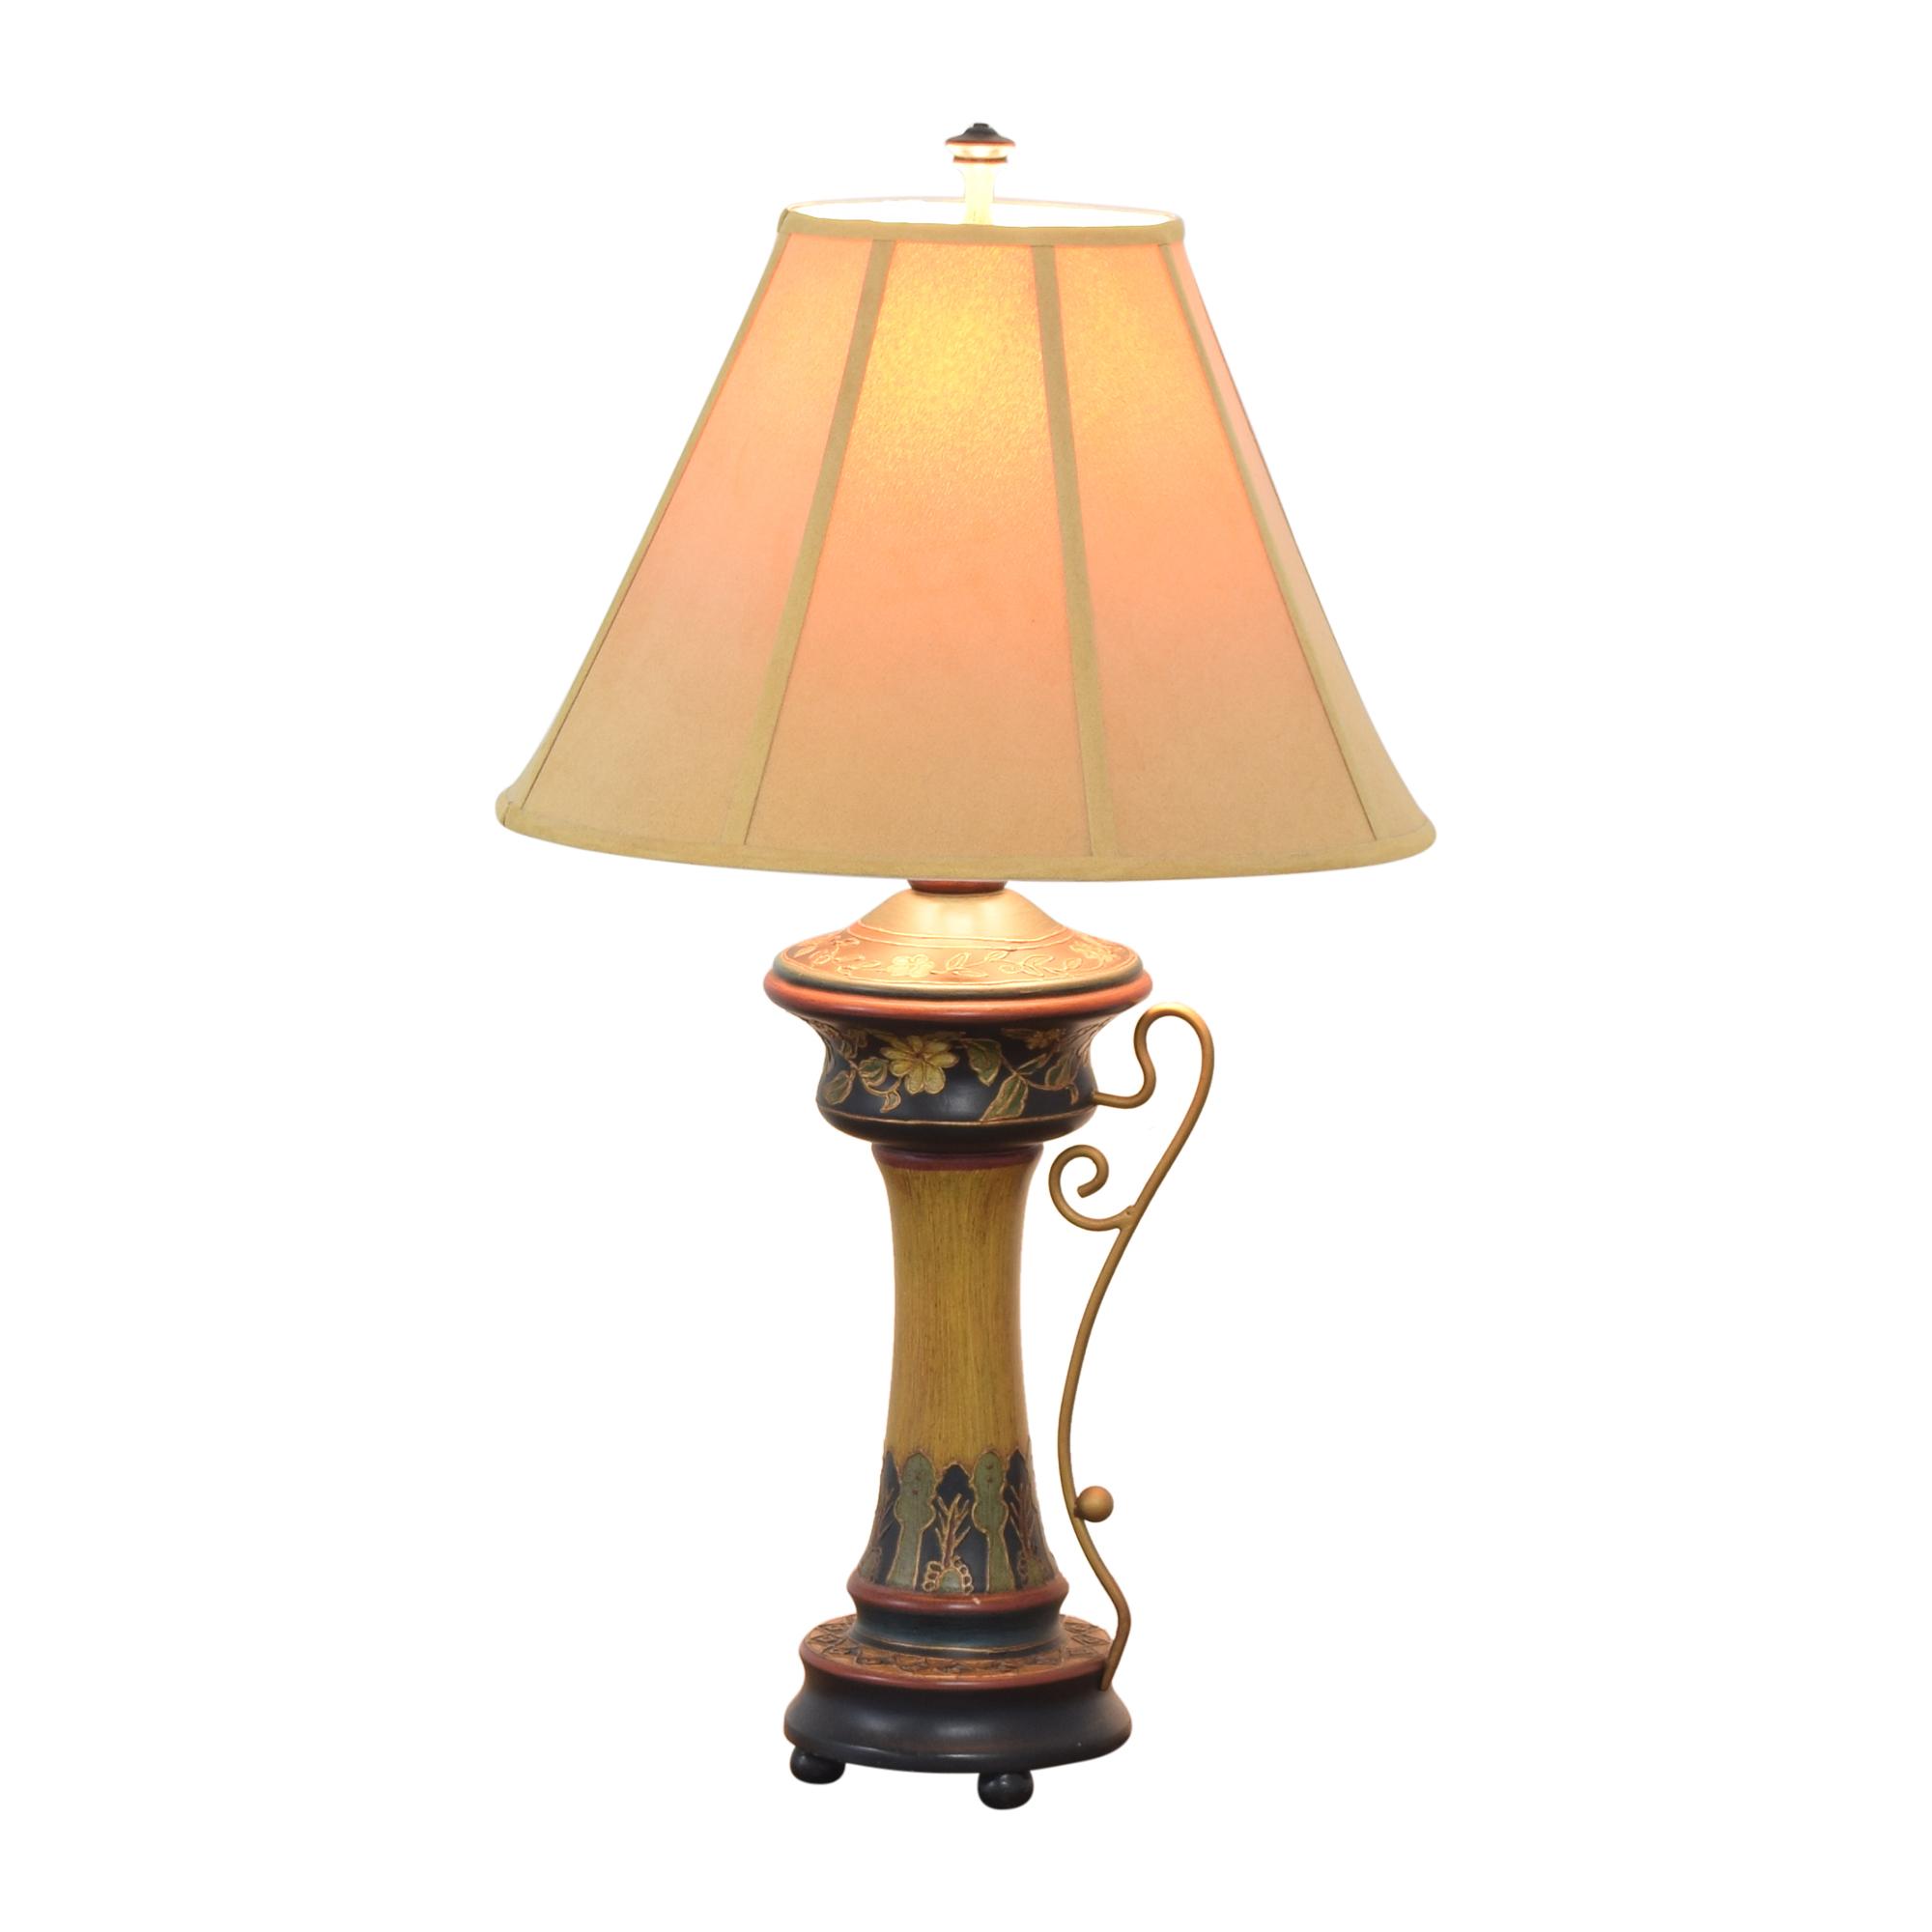 Vintage Table Lamp sale